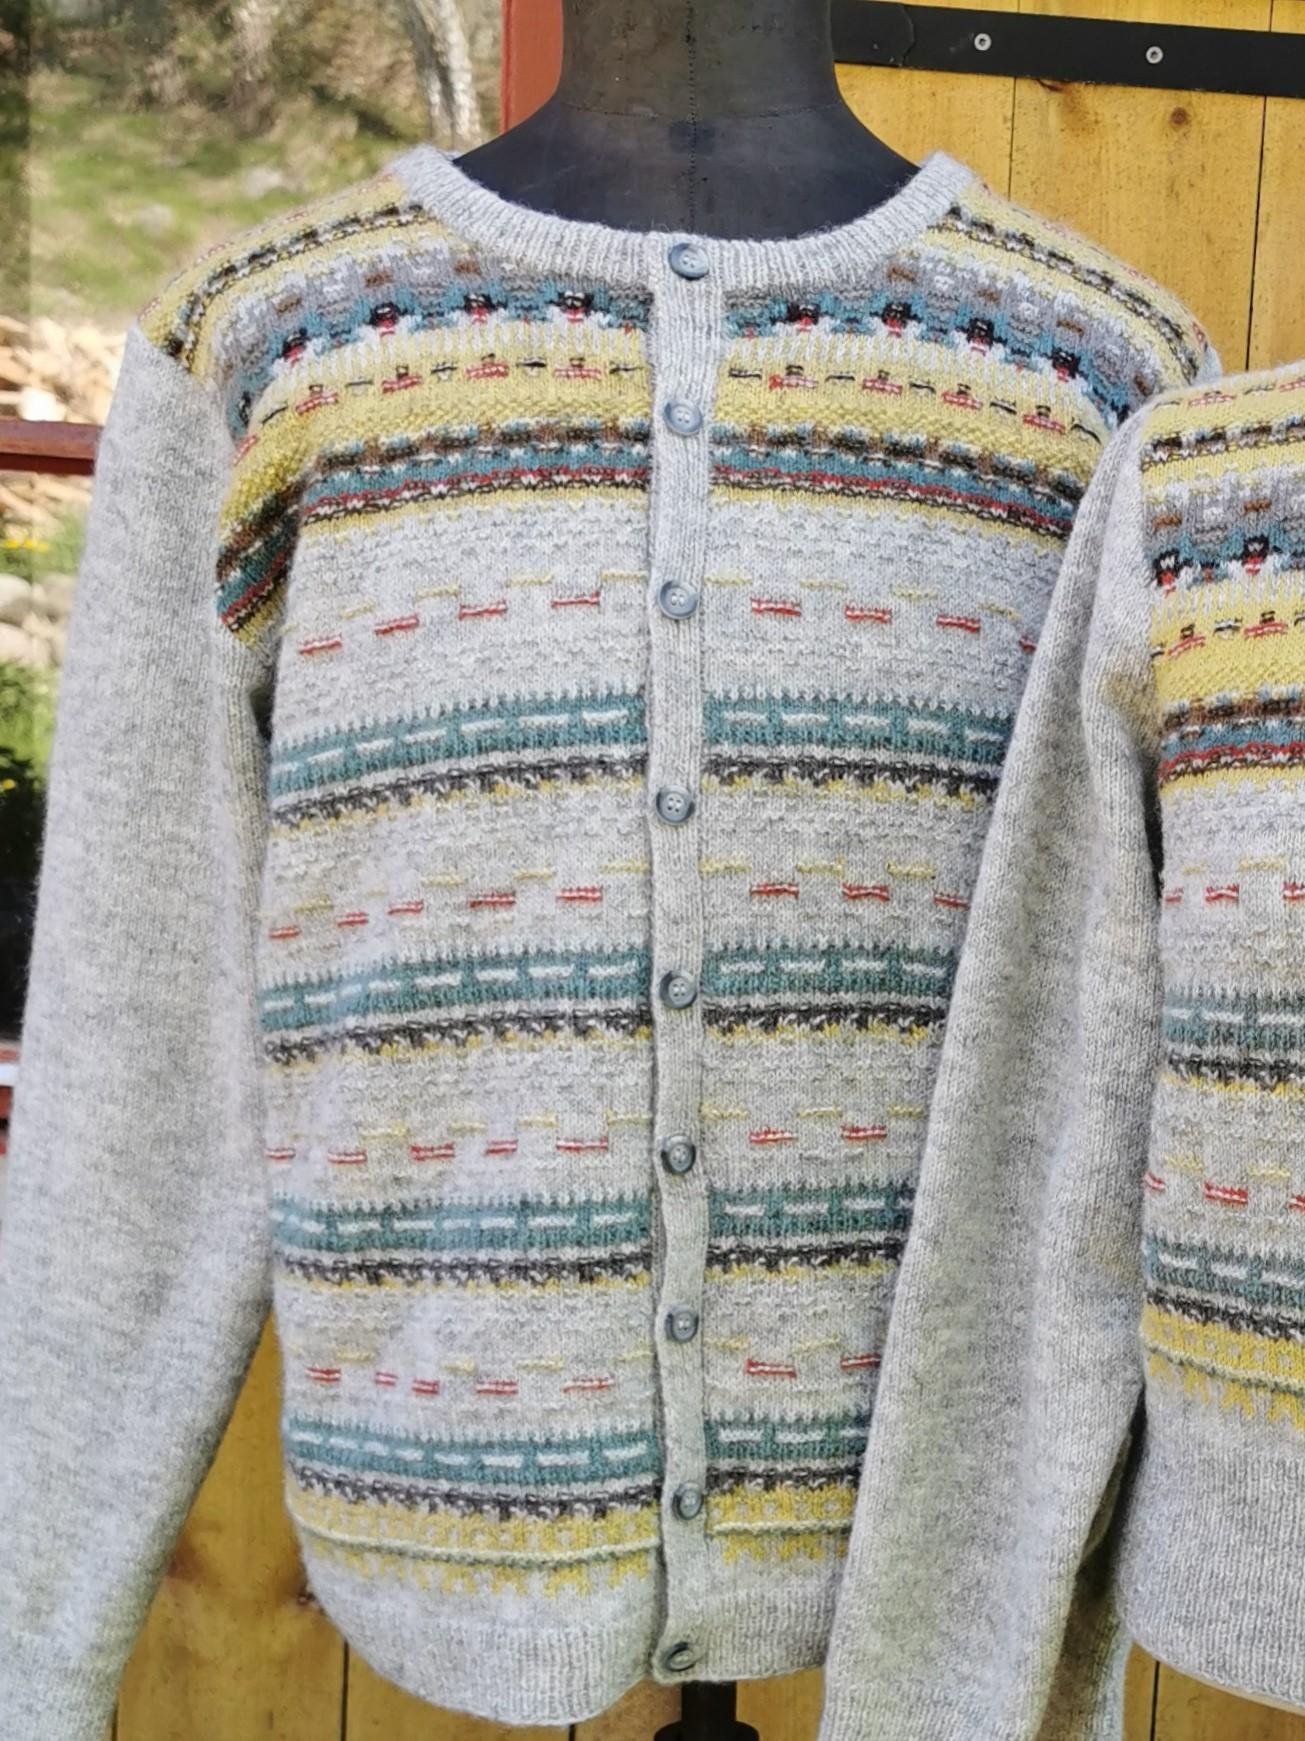 Bohus Stickning Papegojan patterned front woman pullover cardigan kit. Photo P. Silfverberg